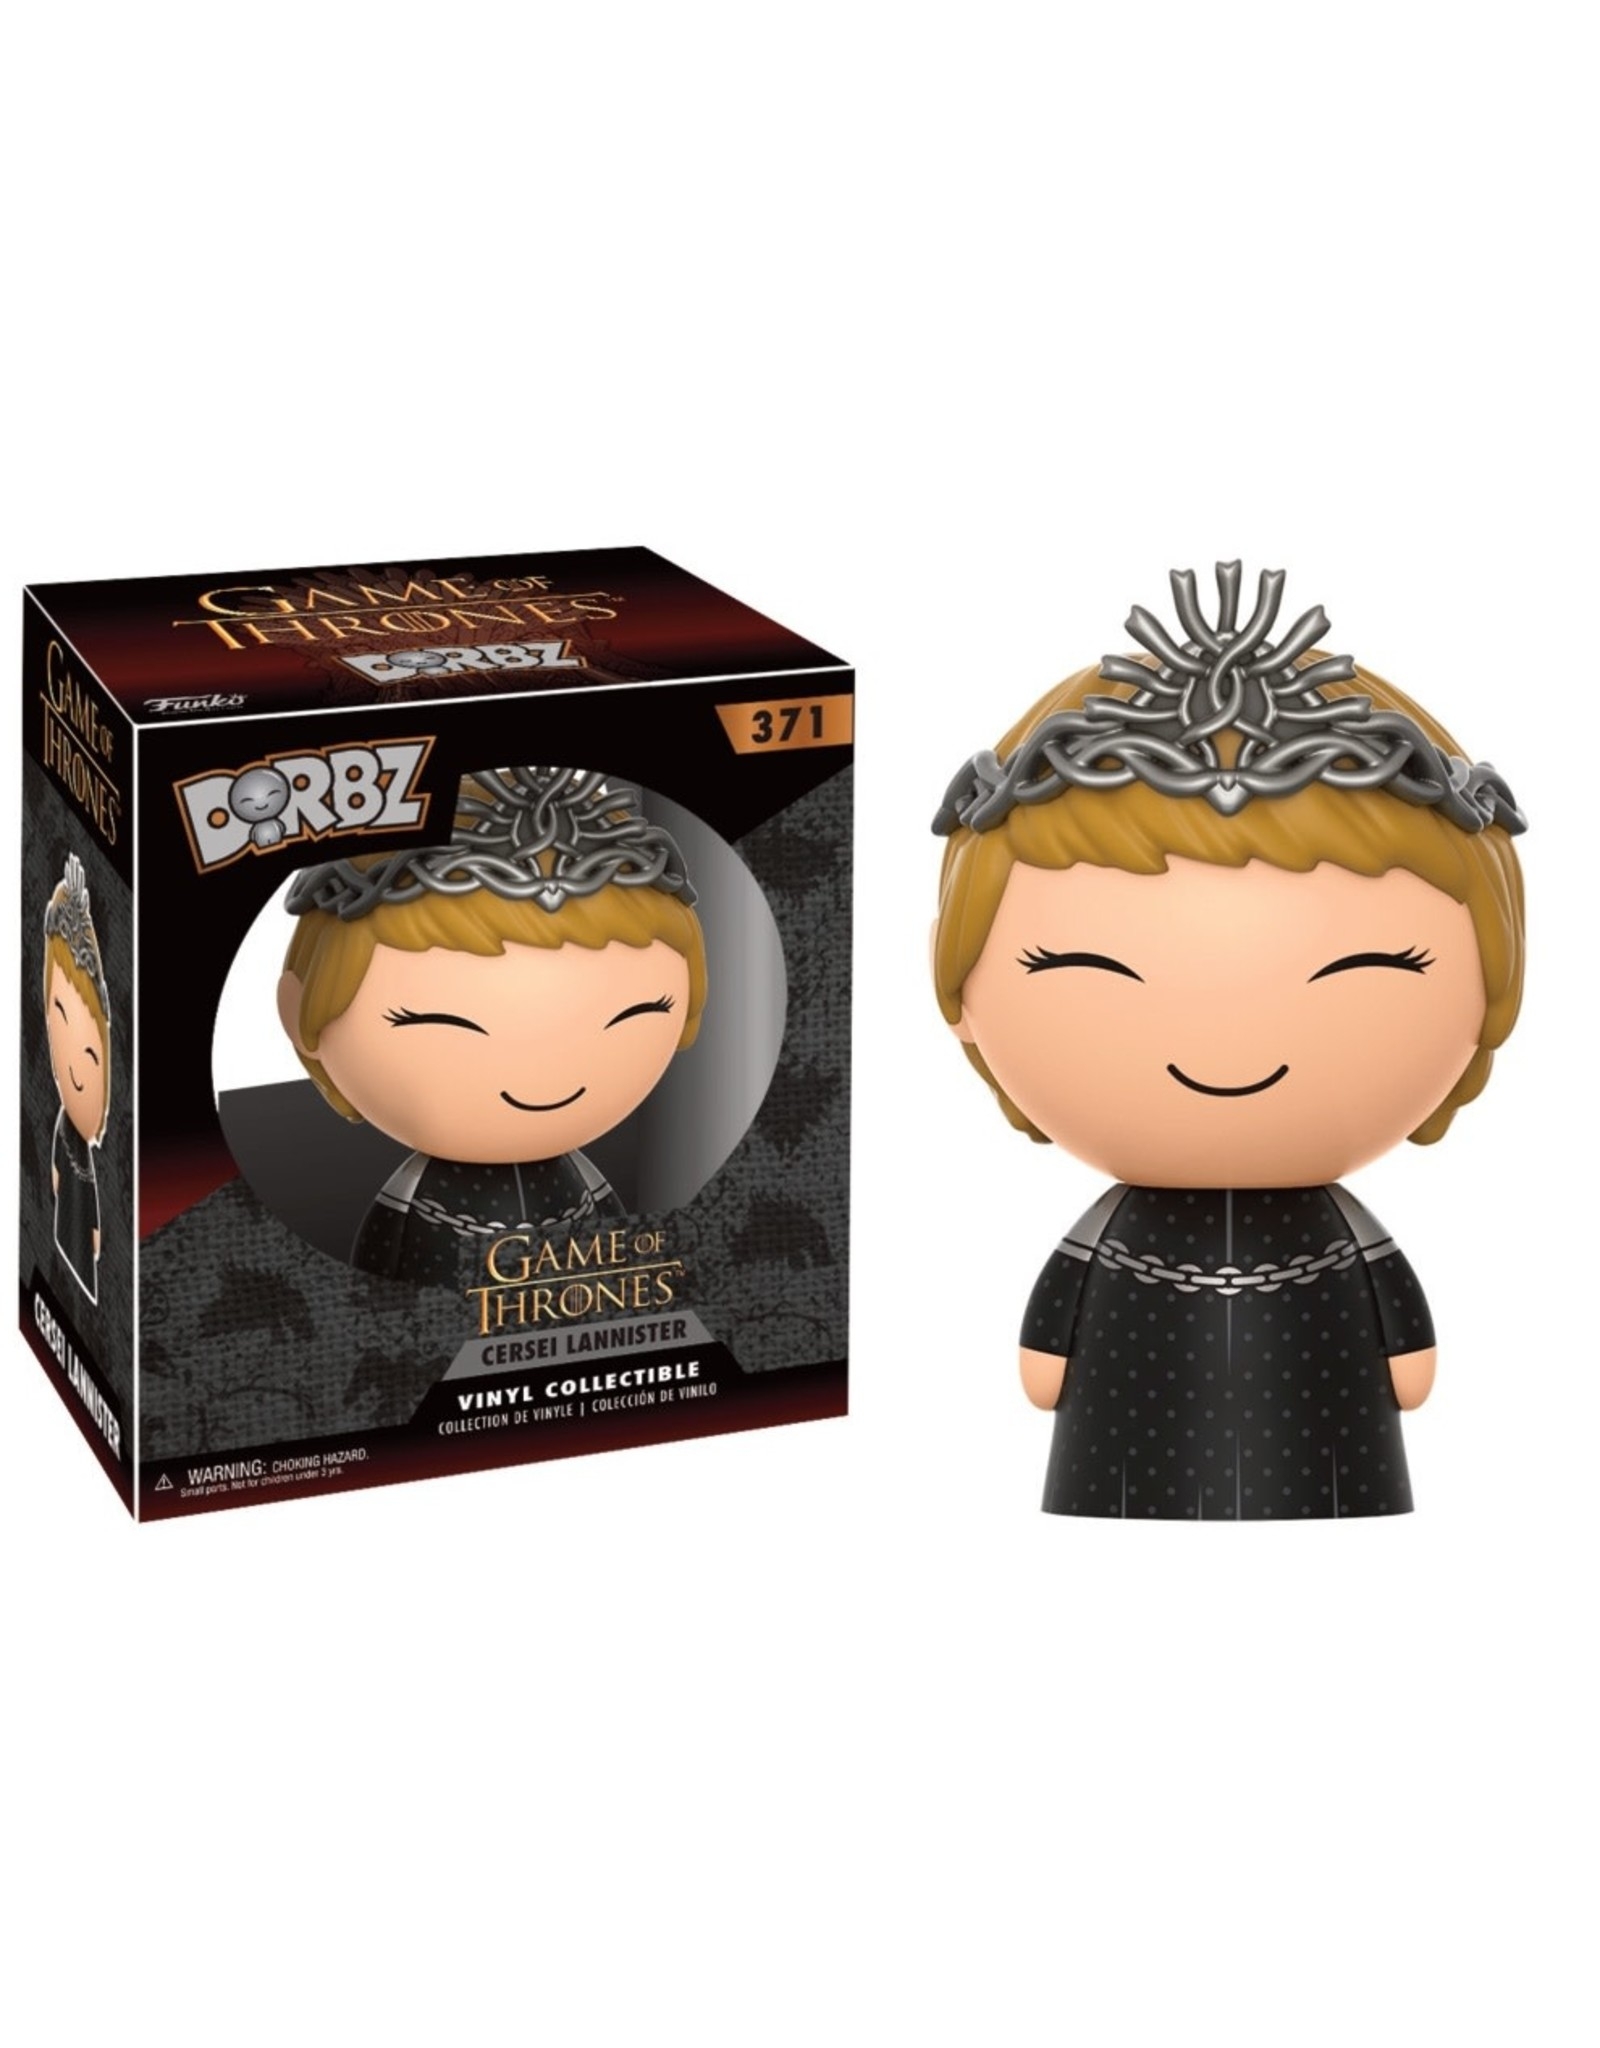 Funko Funko Dorbz Game of Thrones nr371 Cersei Lannister